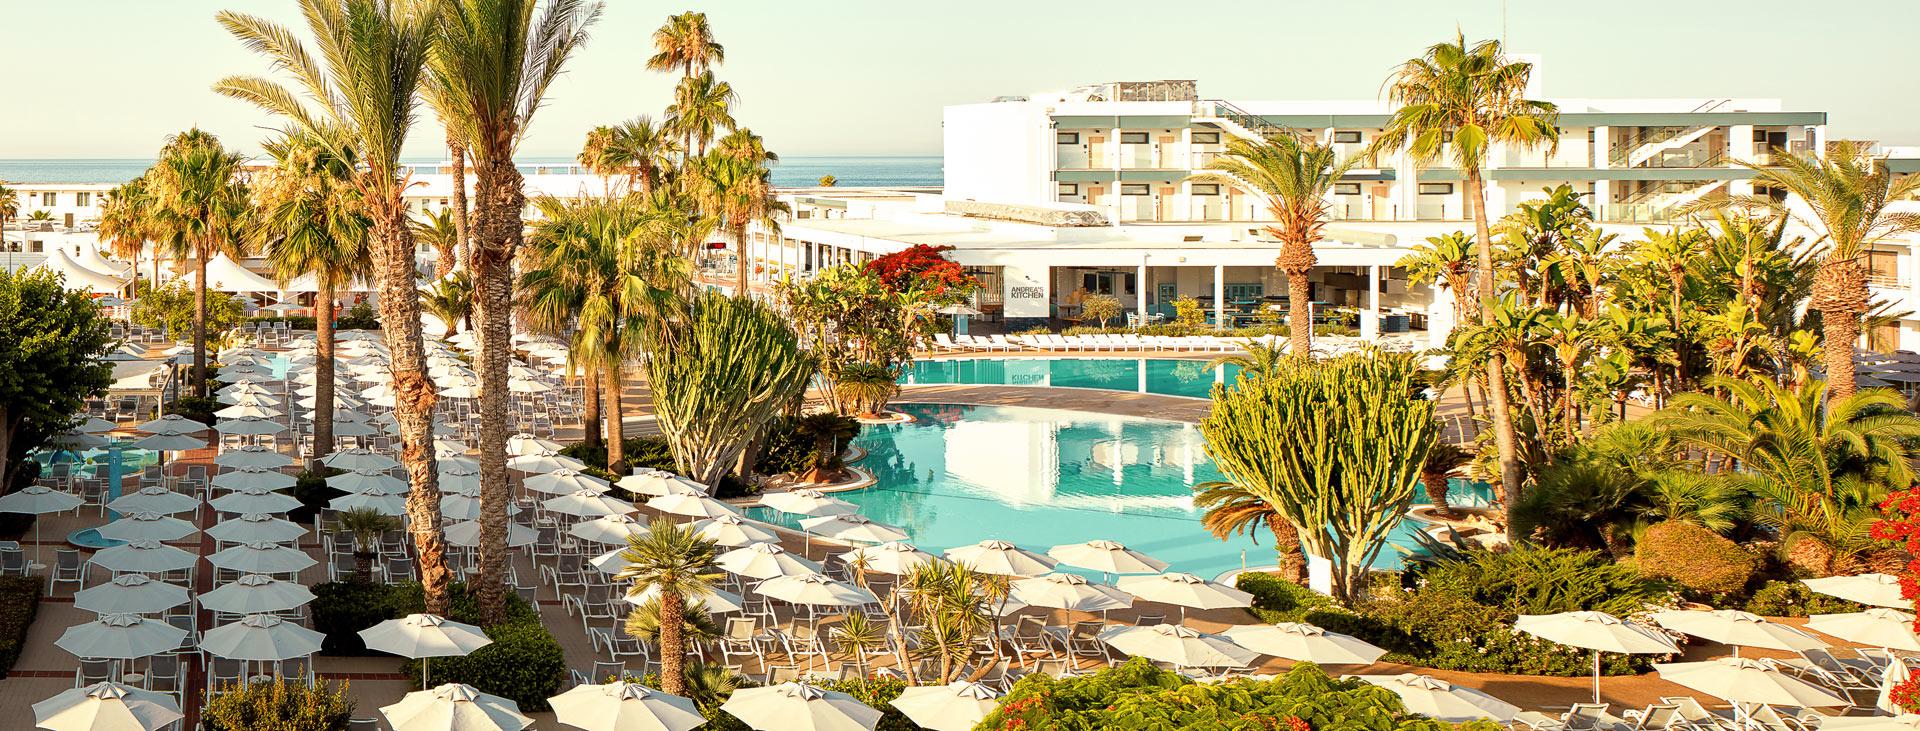 Sunwing Sandy Bay Beach, Ayia Napa, Kypros, Kypros